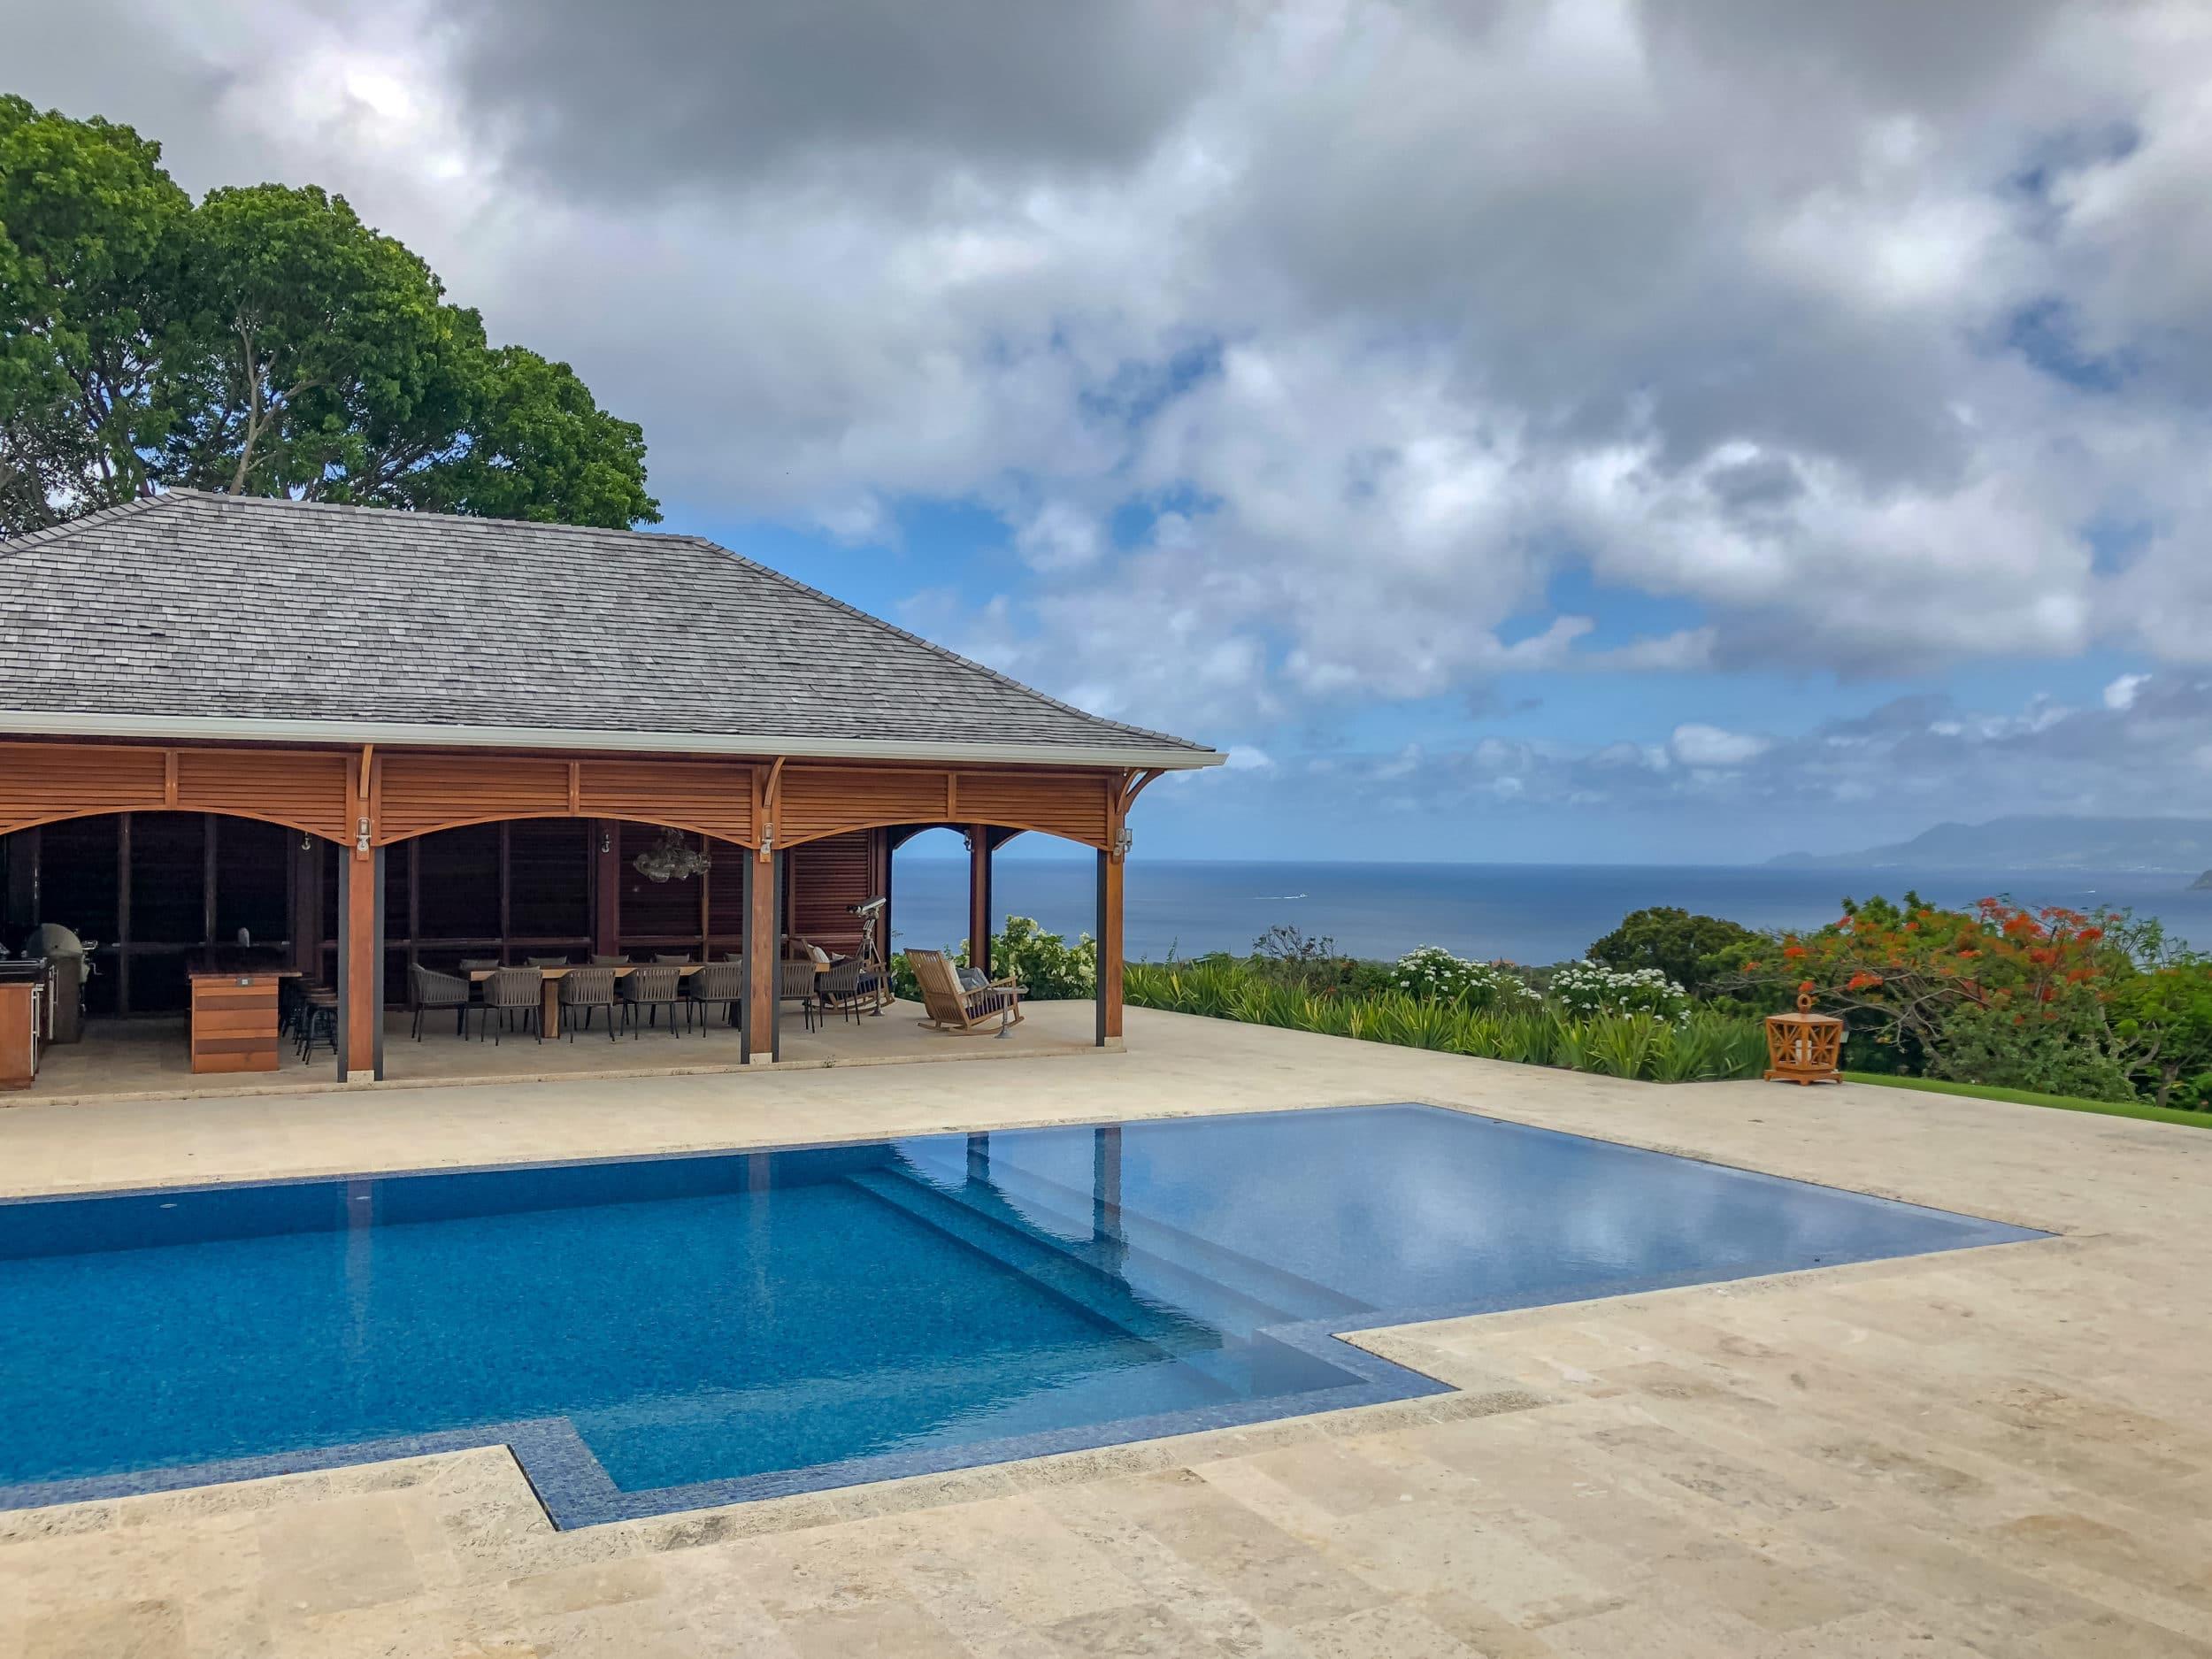 Villas at Four Seasons Nevis